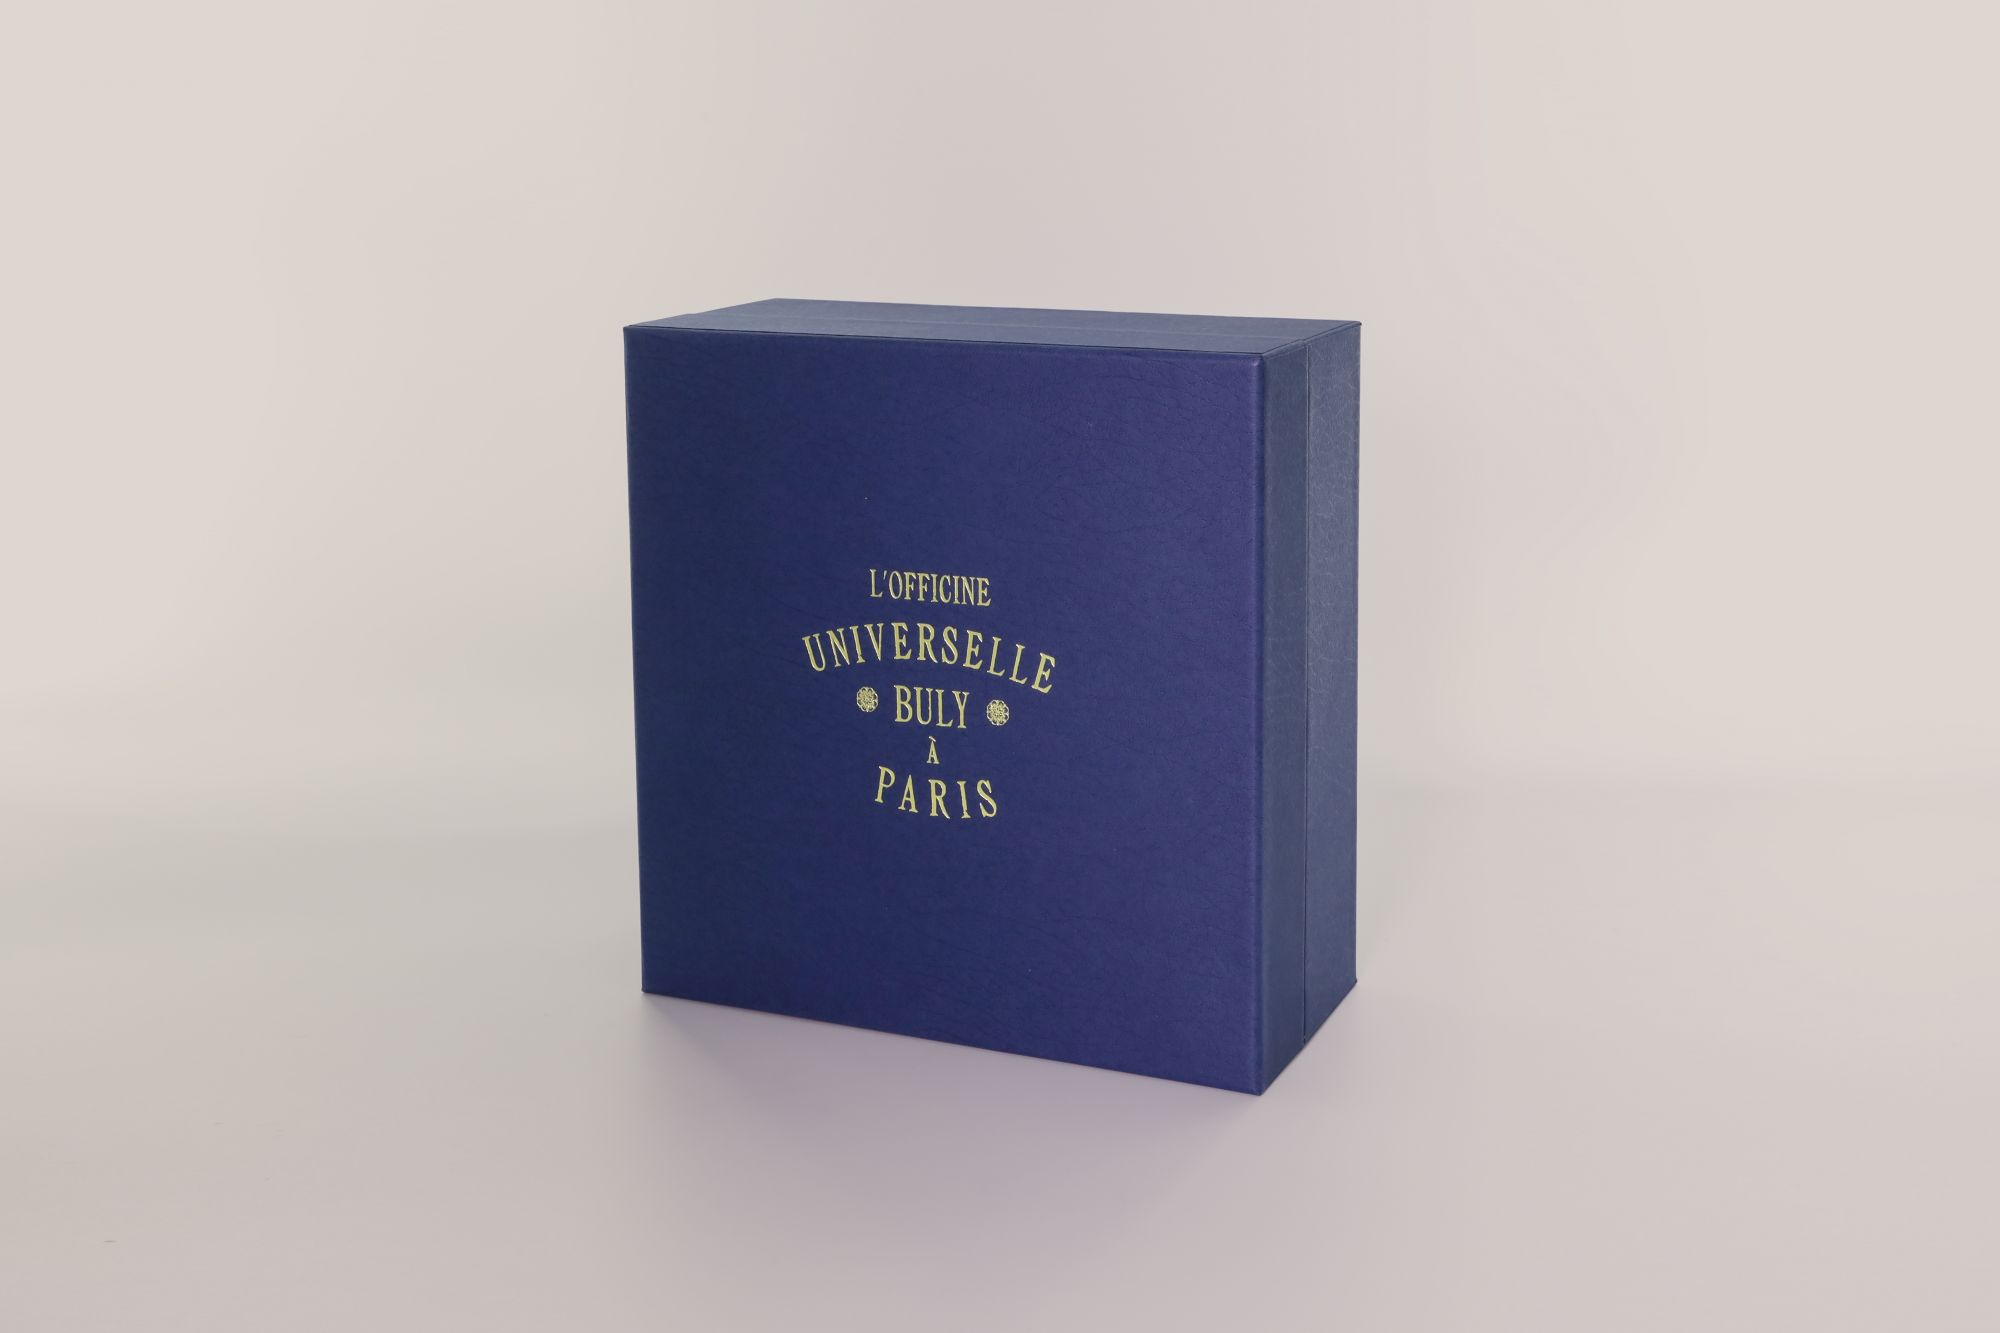 Buly 1803 台灣限定販售聖誕禮盒